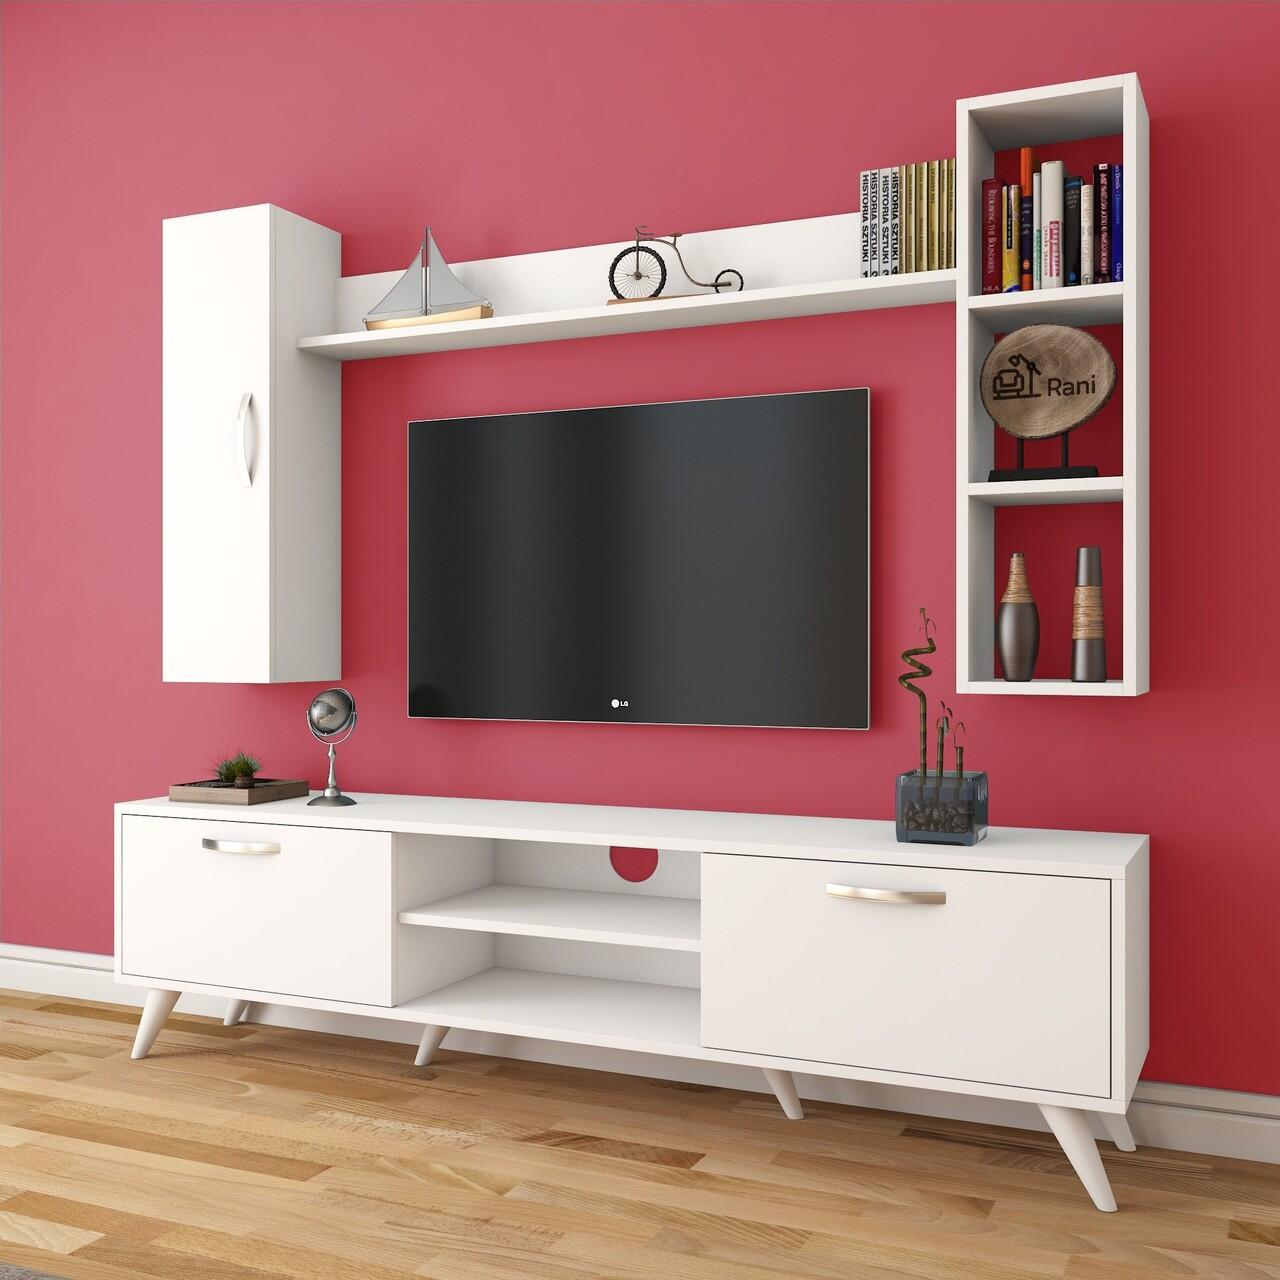 Comoda TV cu 2 rafturi de perete si cabinet M13 - 255, Wren, 180 x 35 x 48.6 cm/90 cm/133 cm, white